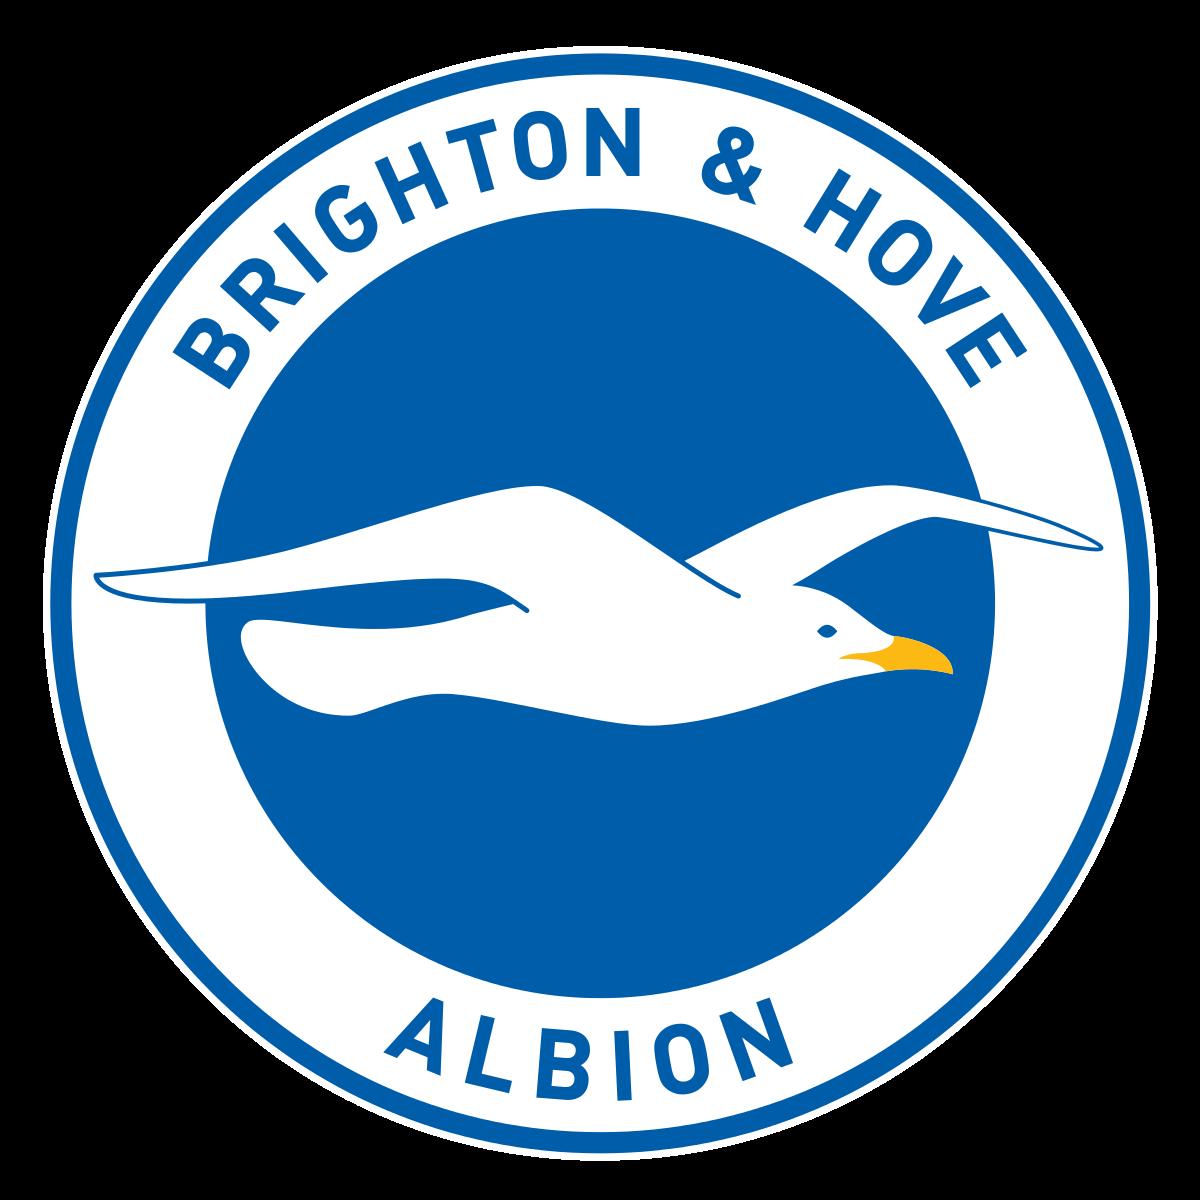 Brighton U-18 logo